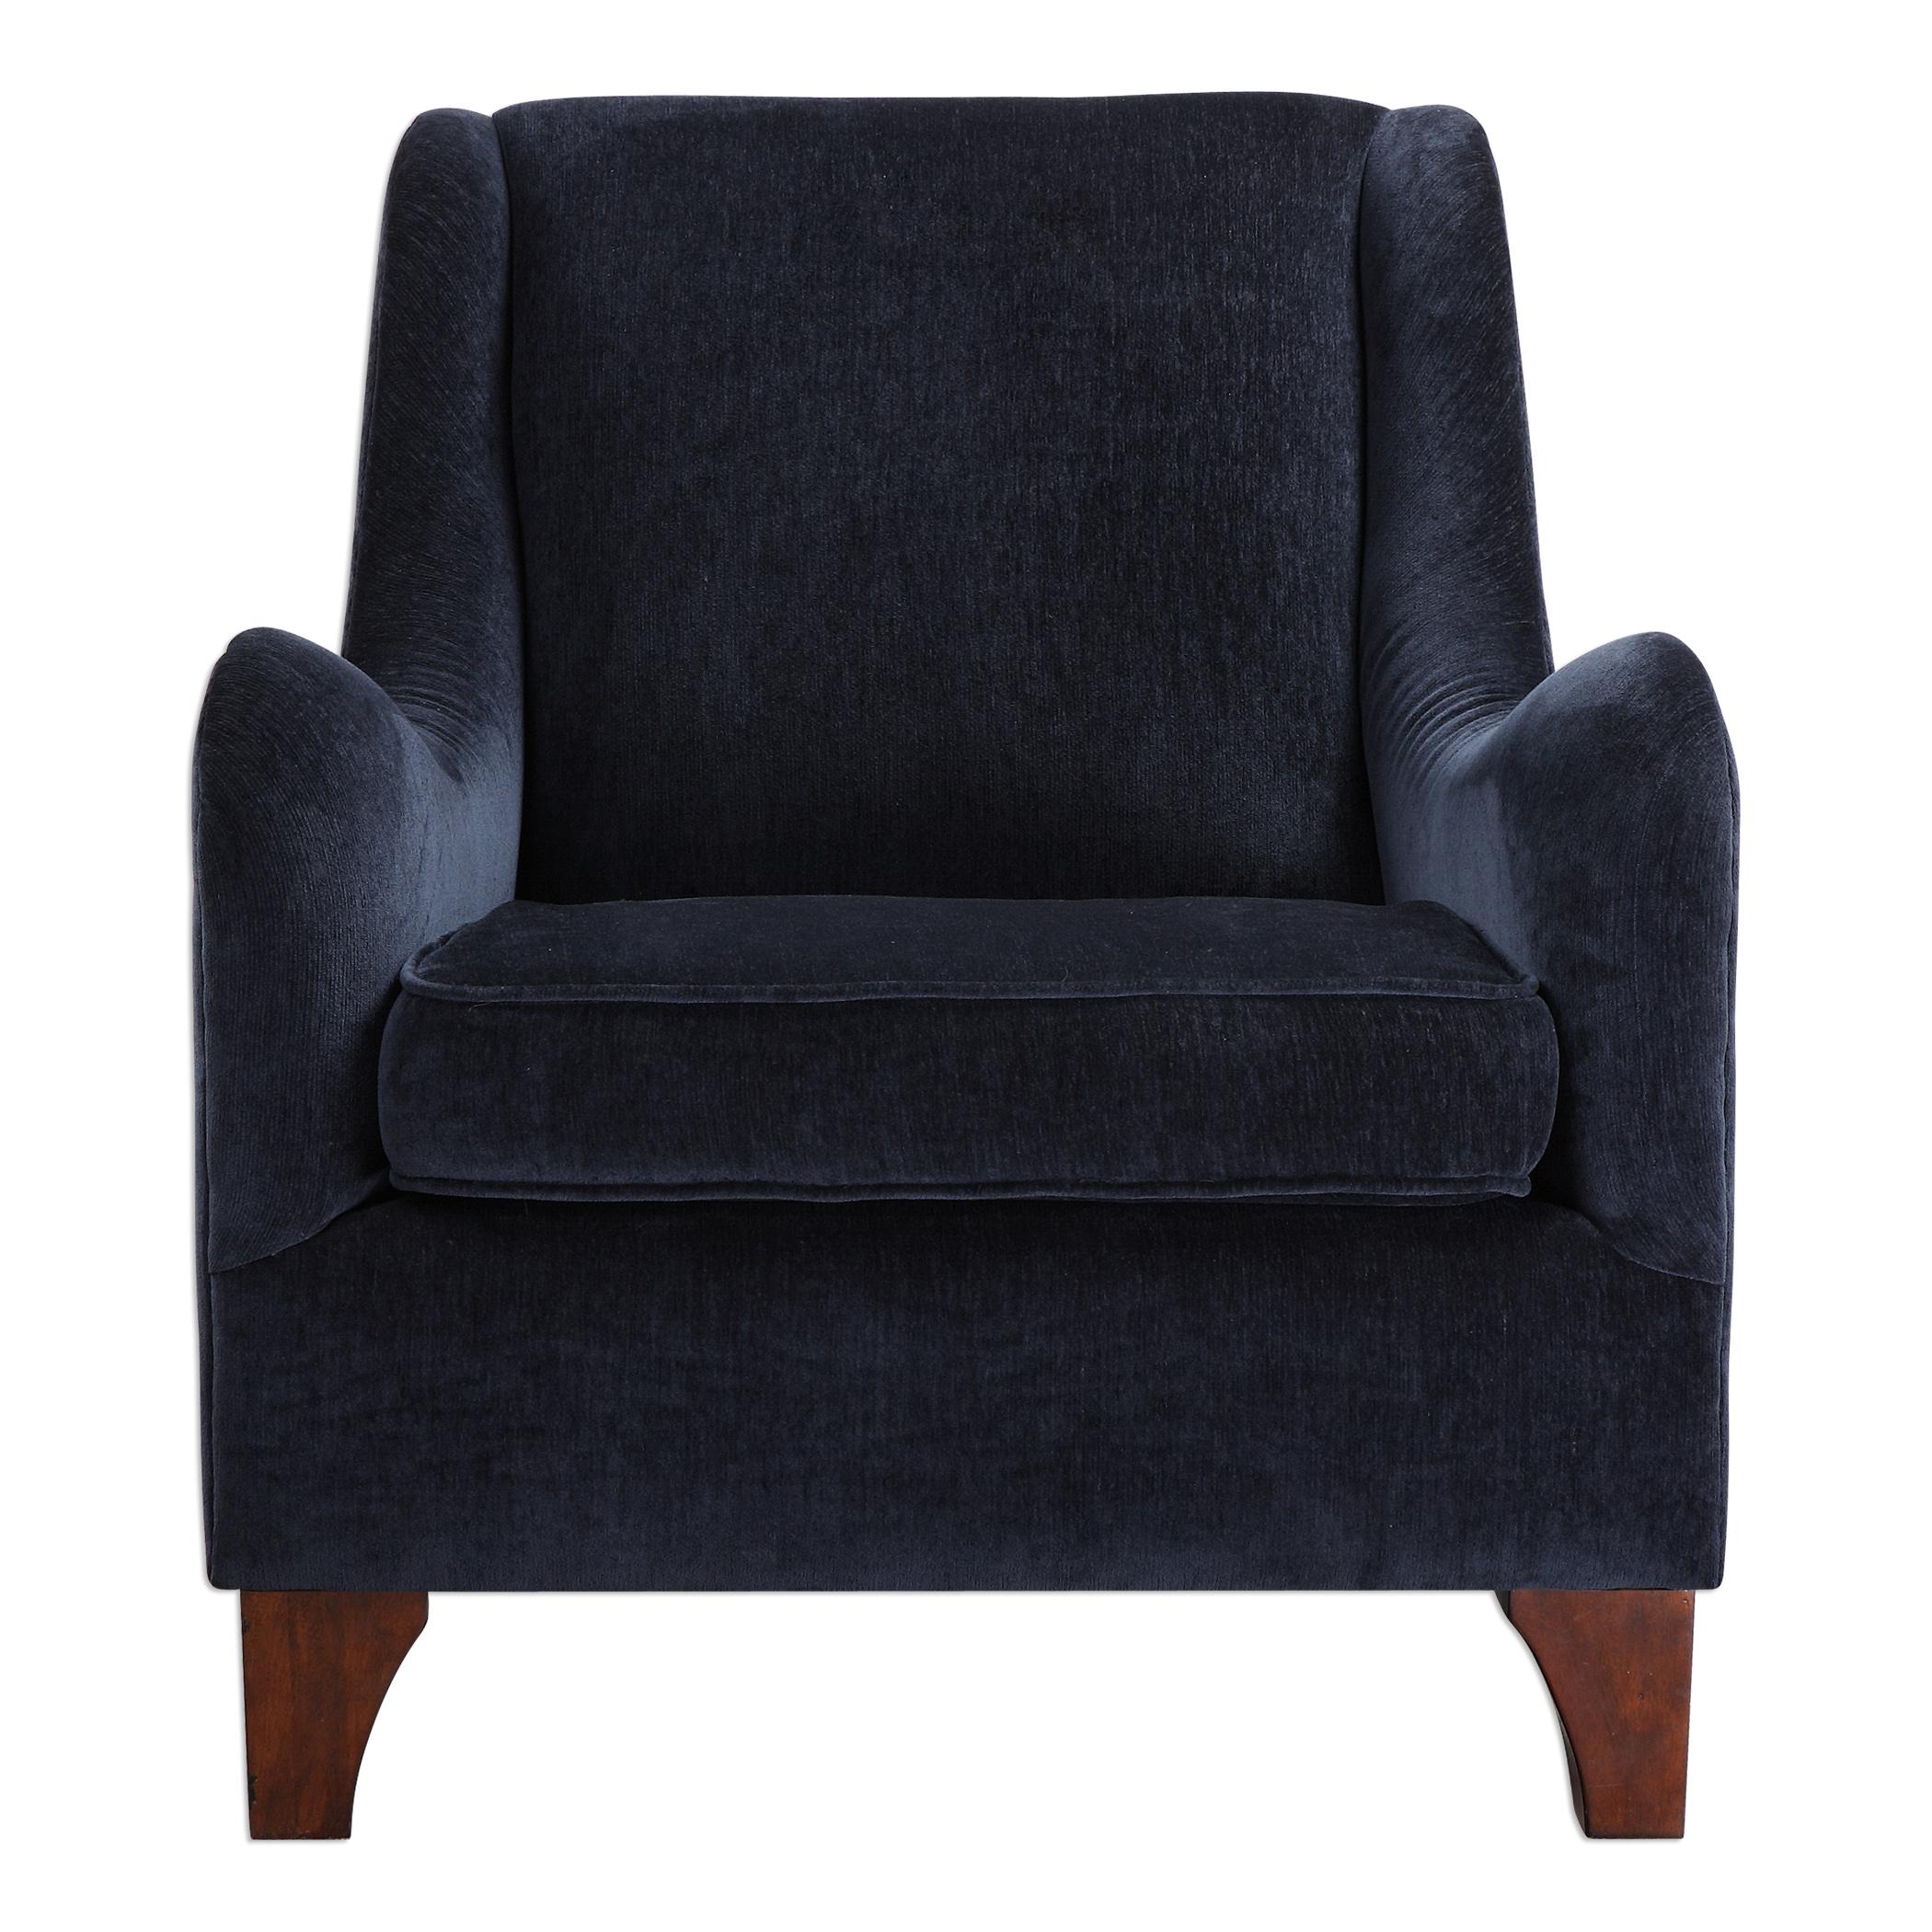 Uttermost Accent Furniture Ferris Midnight Blue Armchair - Item Number: 23273